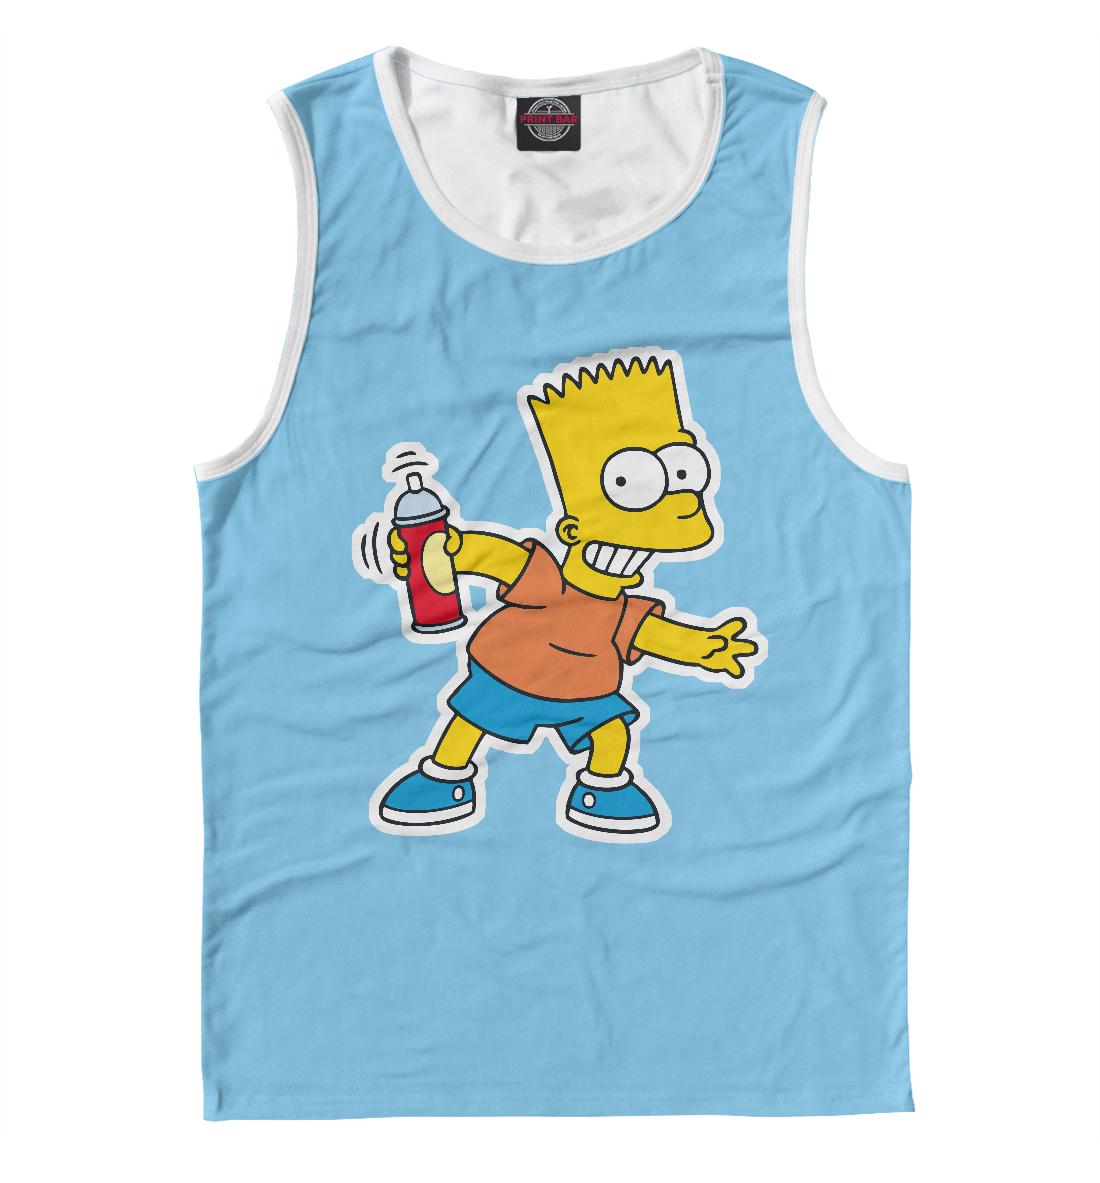 Купить Барт Симпсон с баллончиком, Printbar, Майки, SIM-737217-may-2